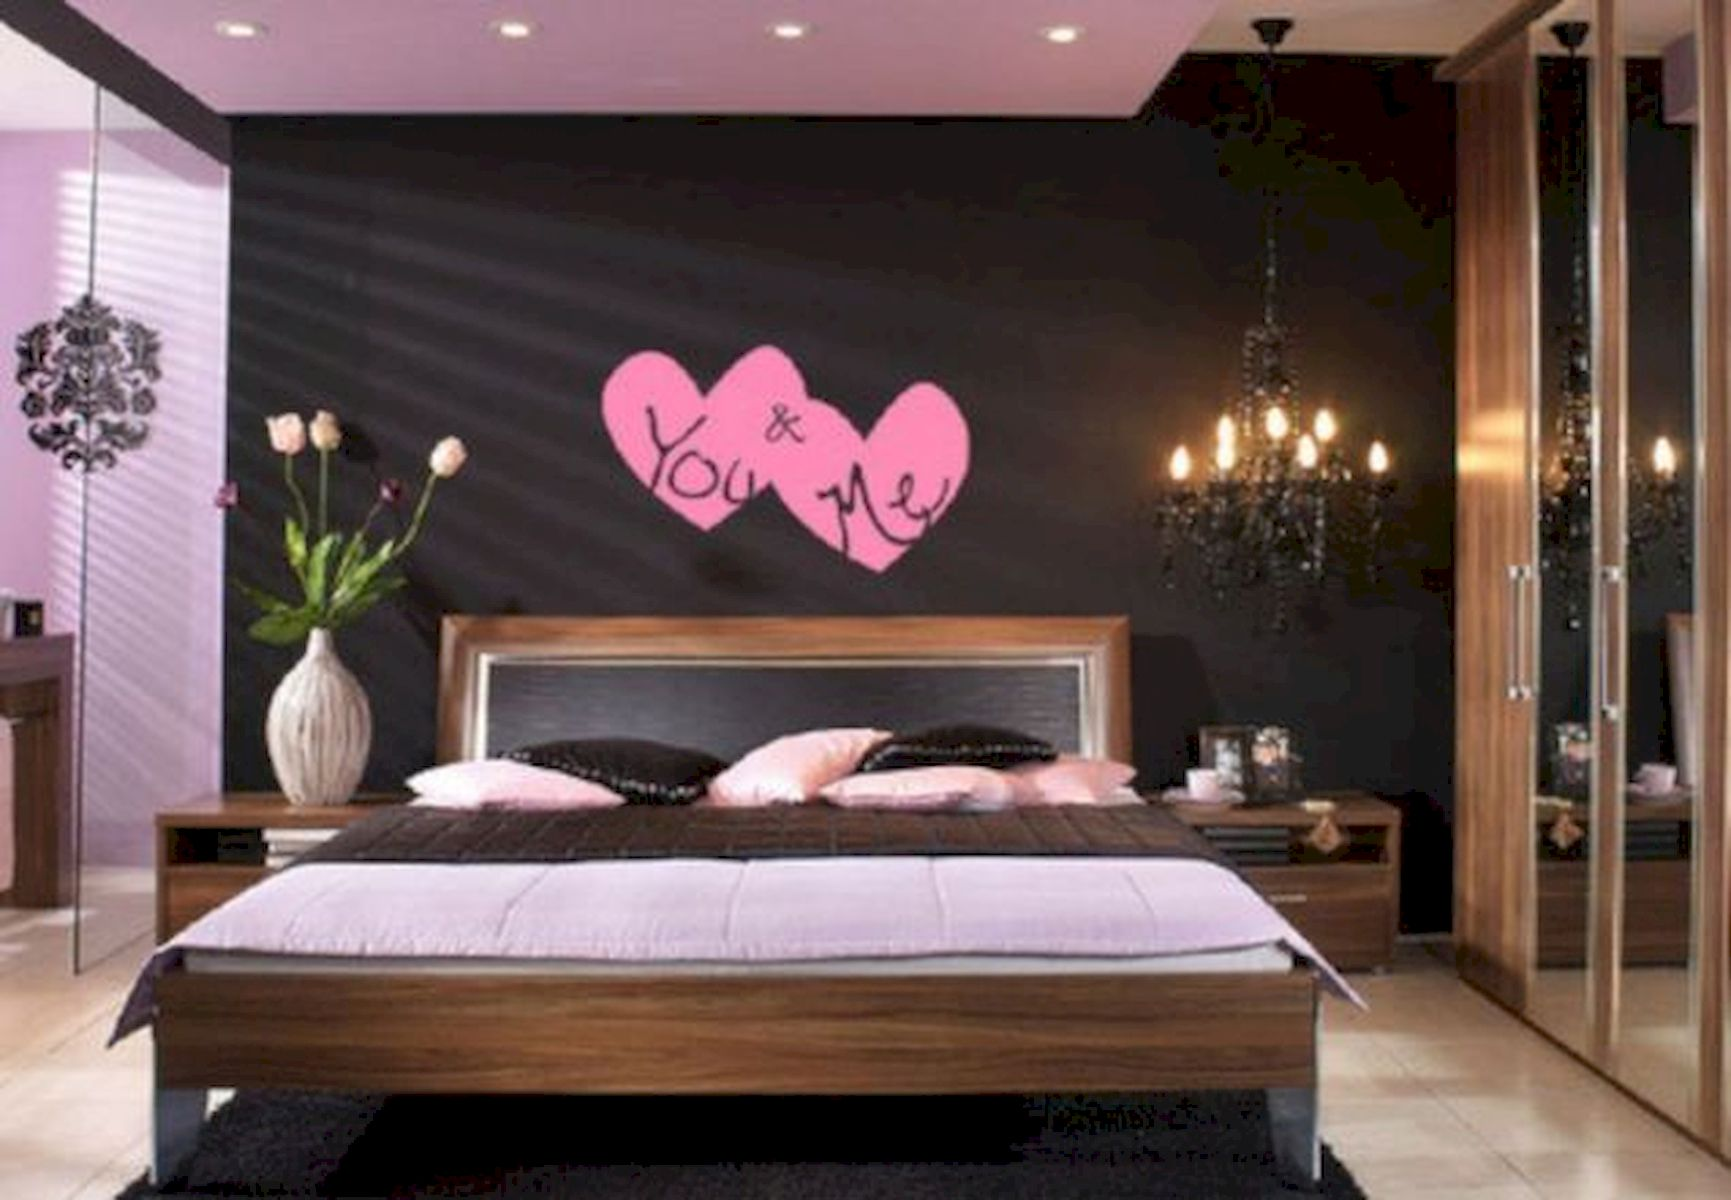 55 Romantic Bedroom Decor For Couple (42)